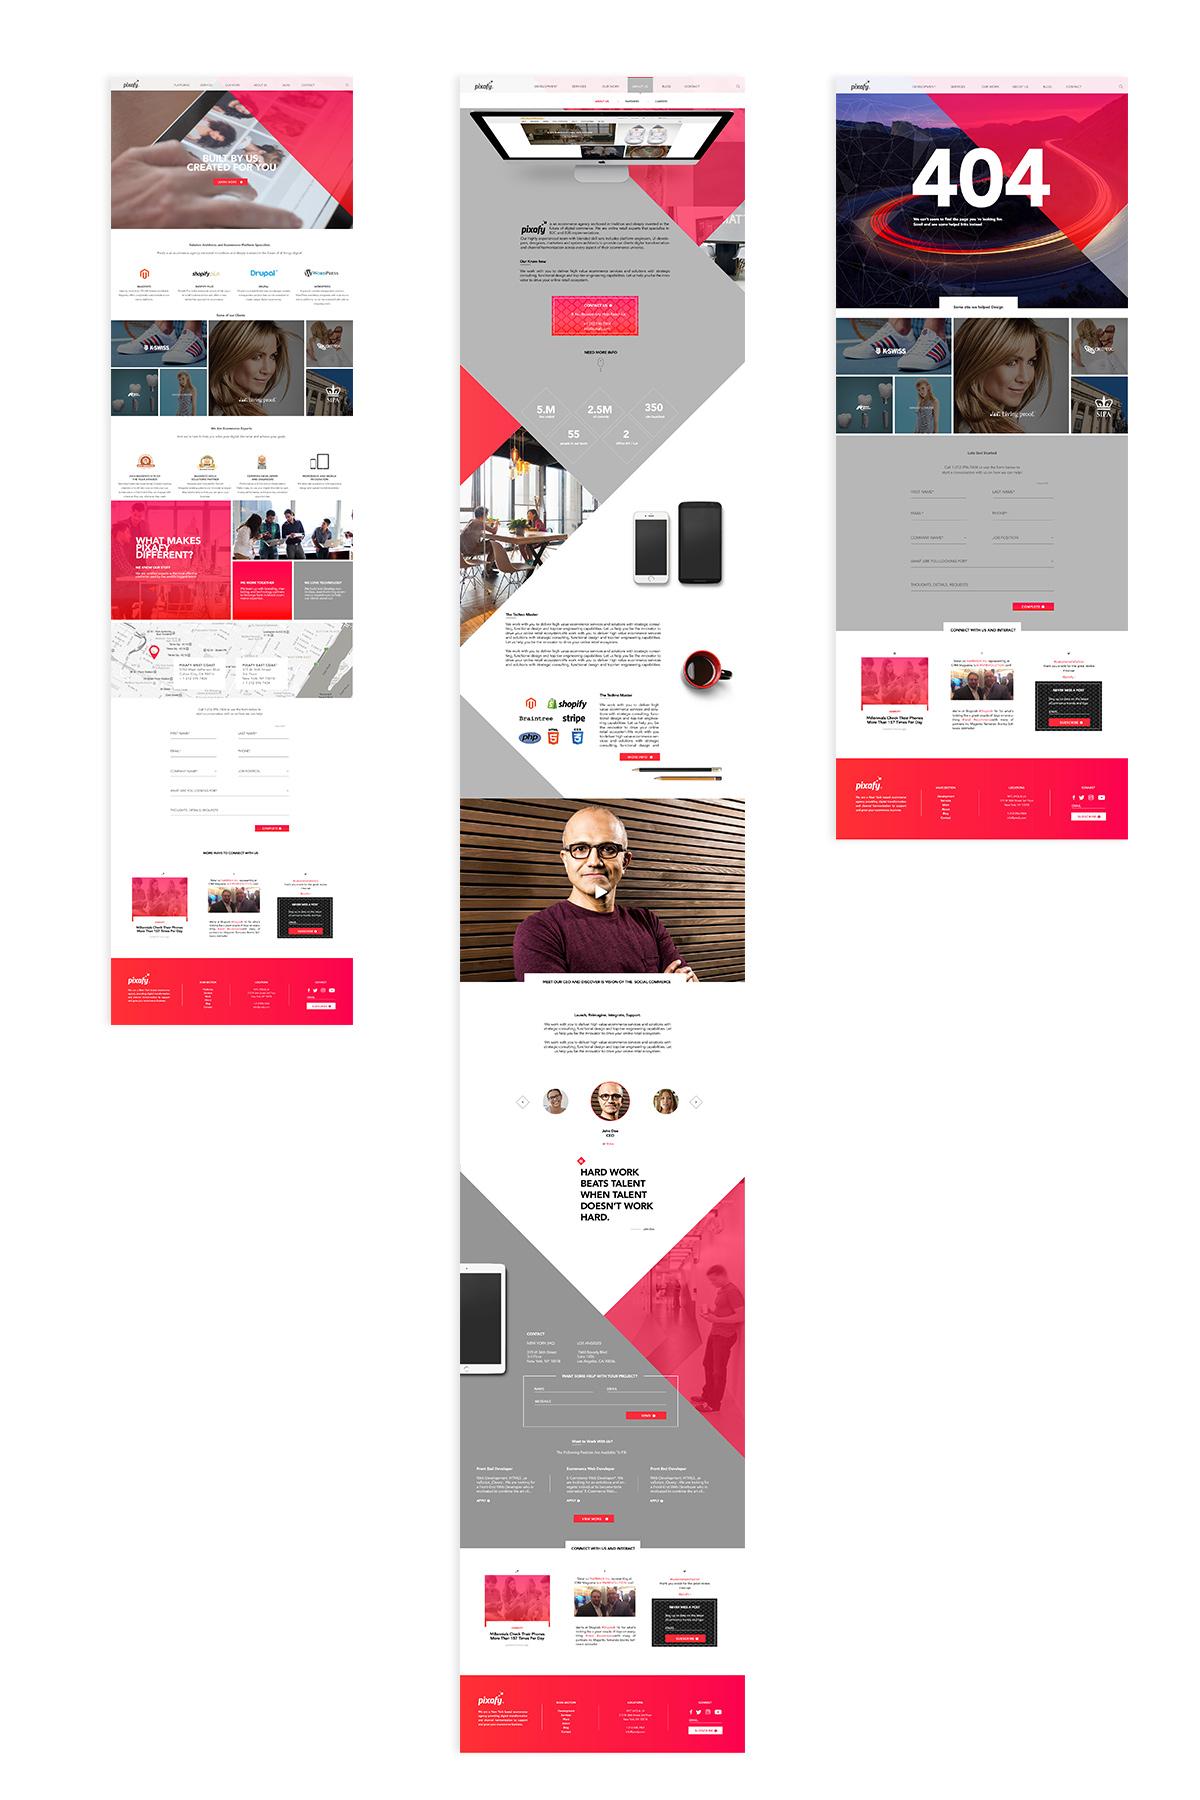 PIXAFY_project-layout-Test